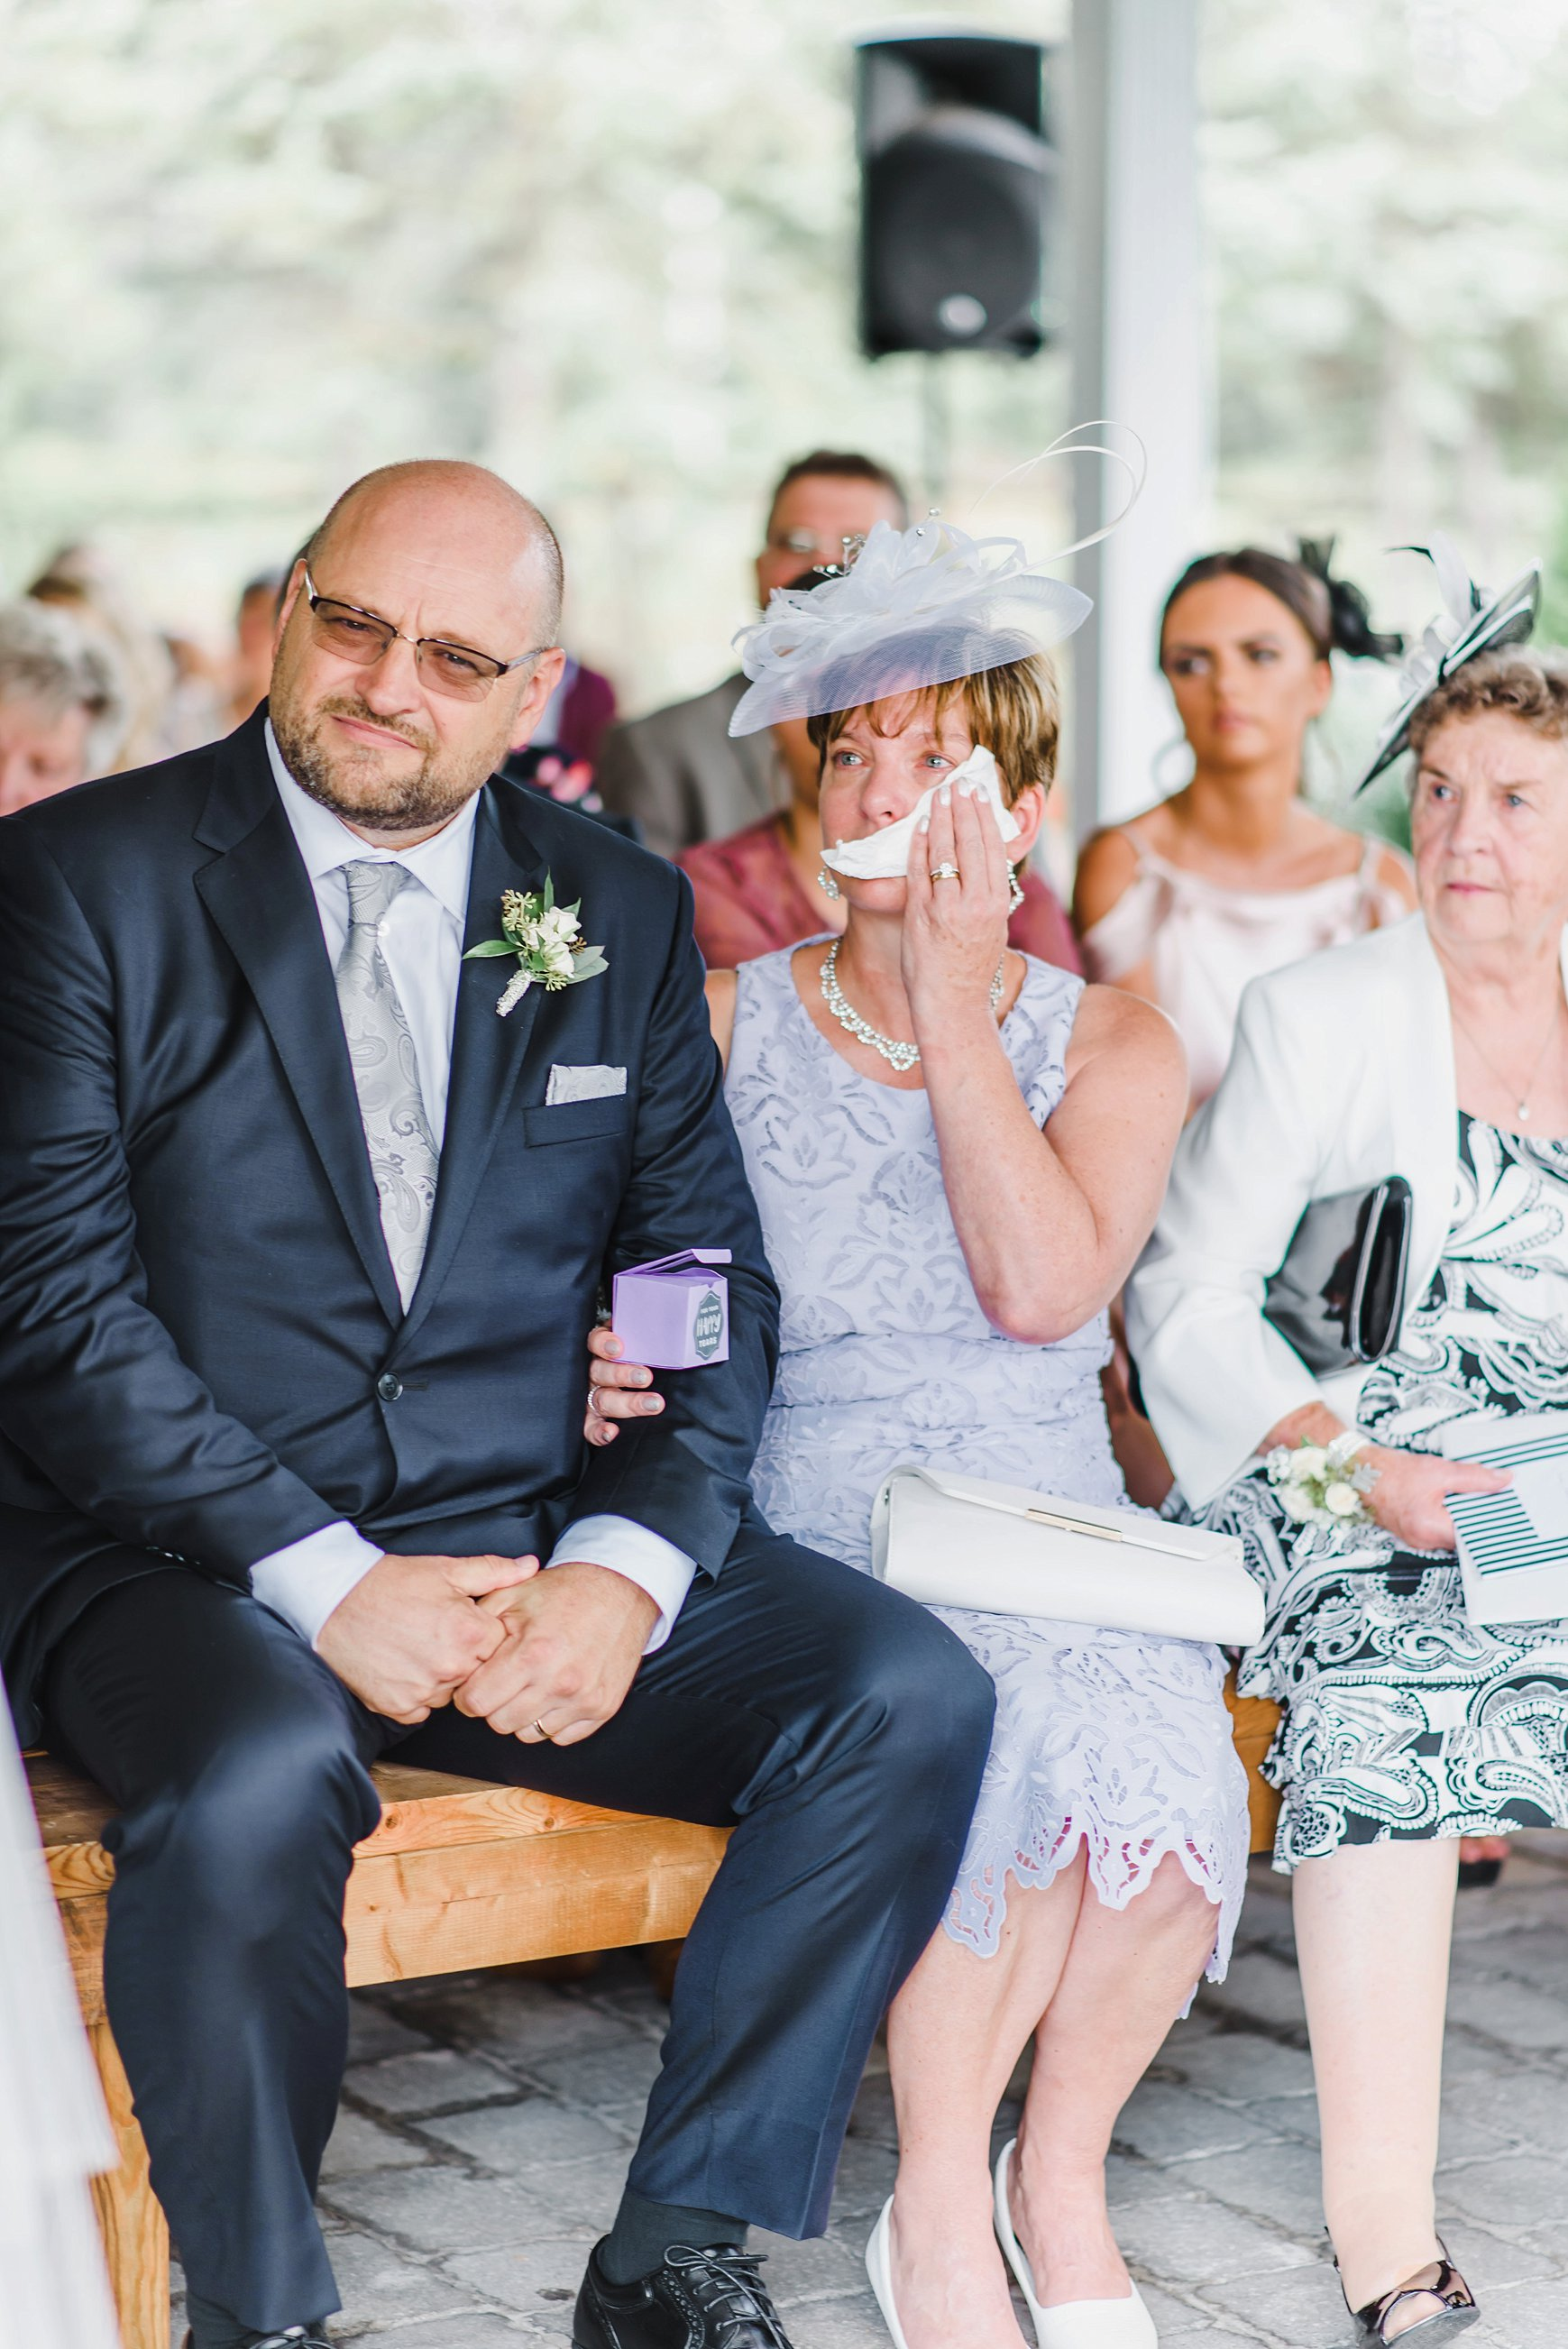 light airy indie fine art ottawa wedding photographer | Ali and Batoul Photography_1275.jpg